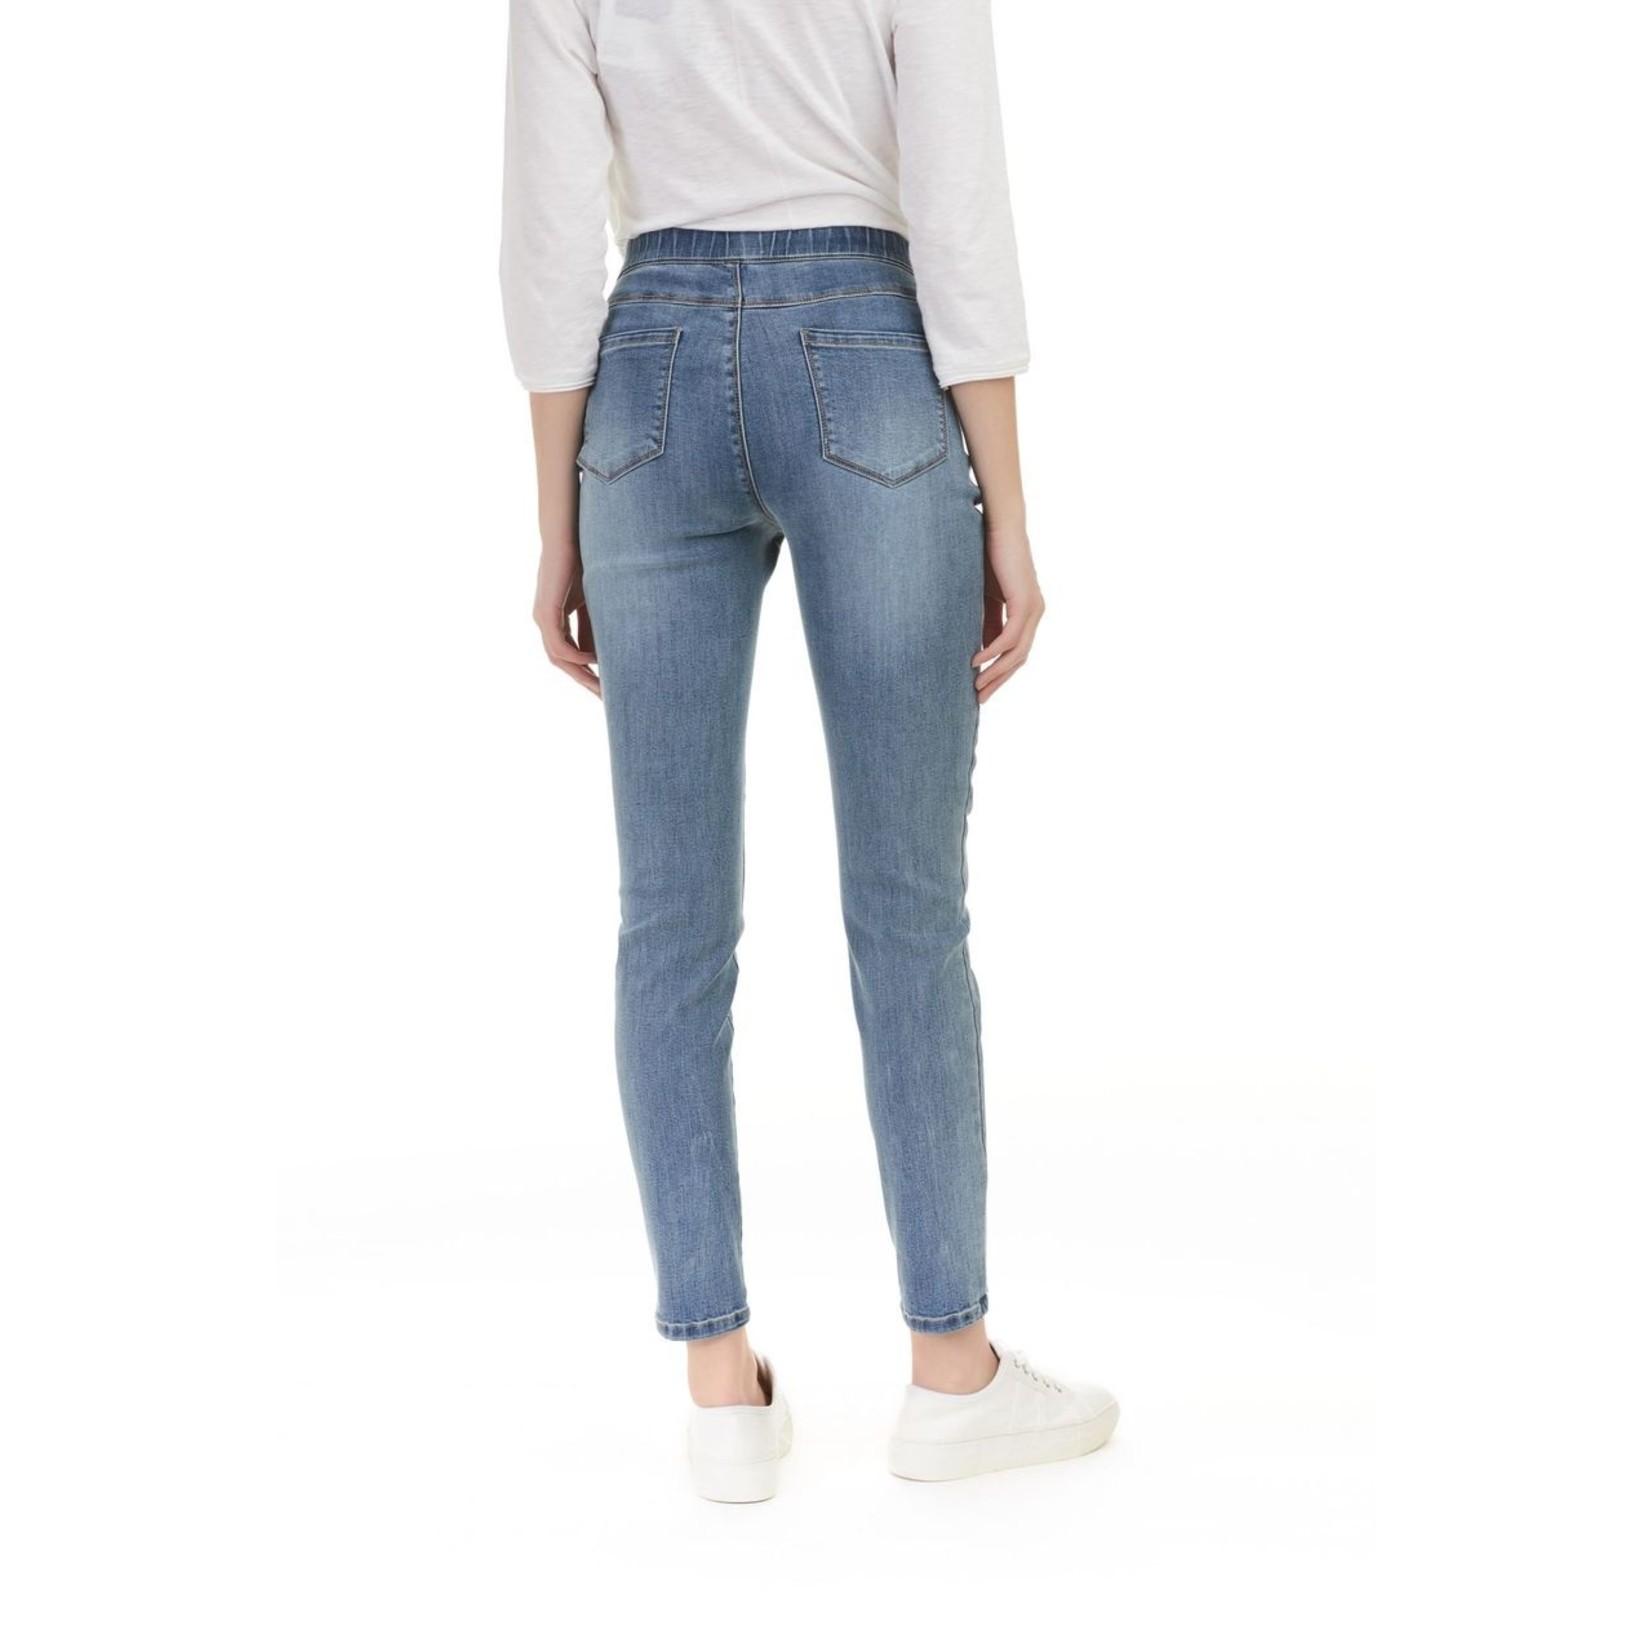 Charlie B Tencel Pull-On Jeans